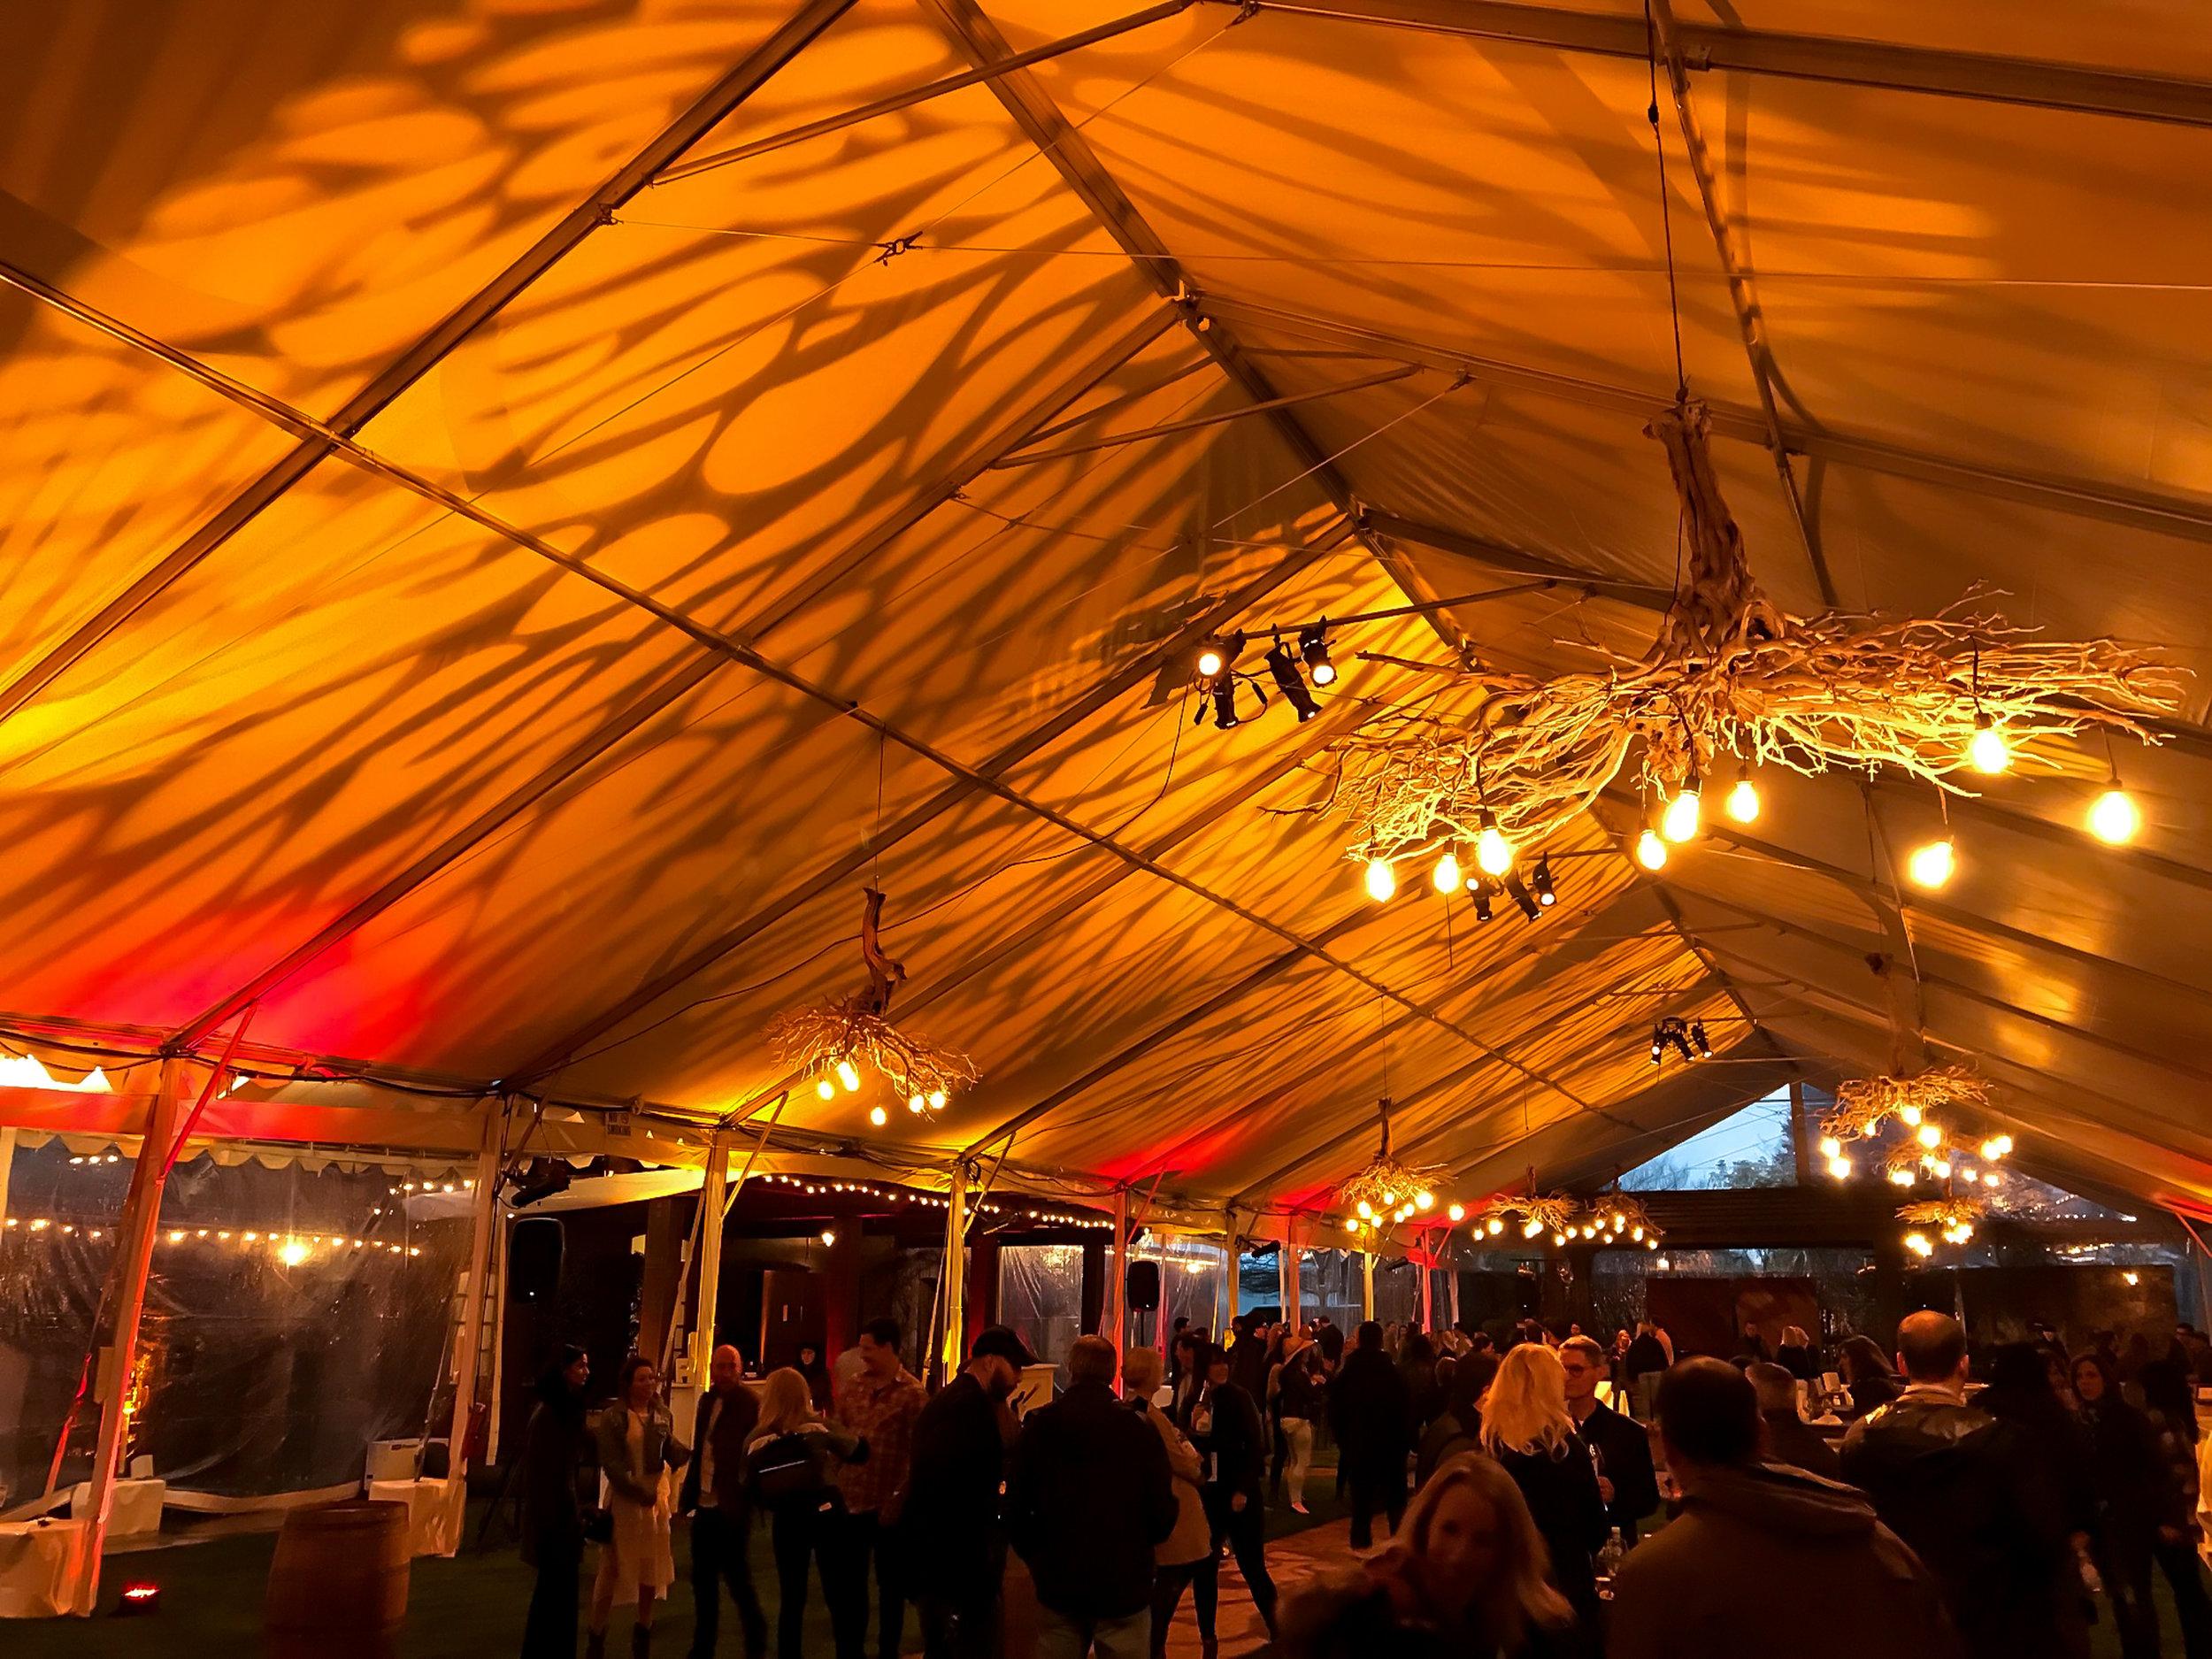 Lighting - Tent Setup - After.jpg